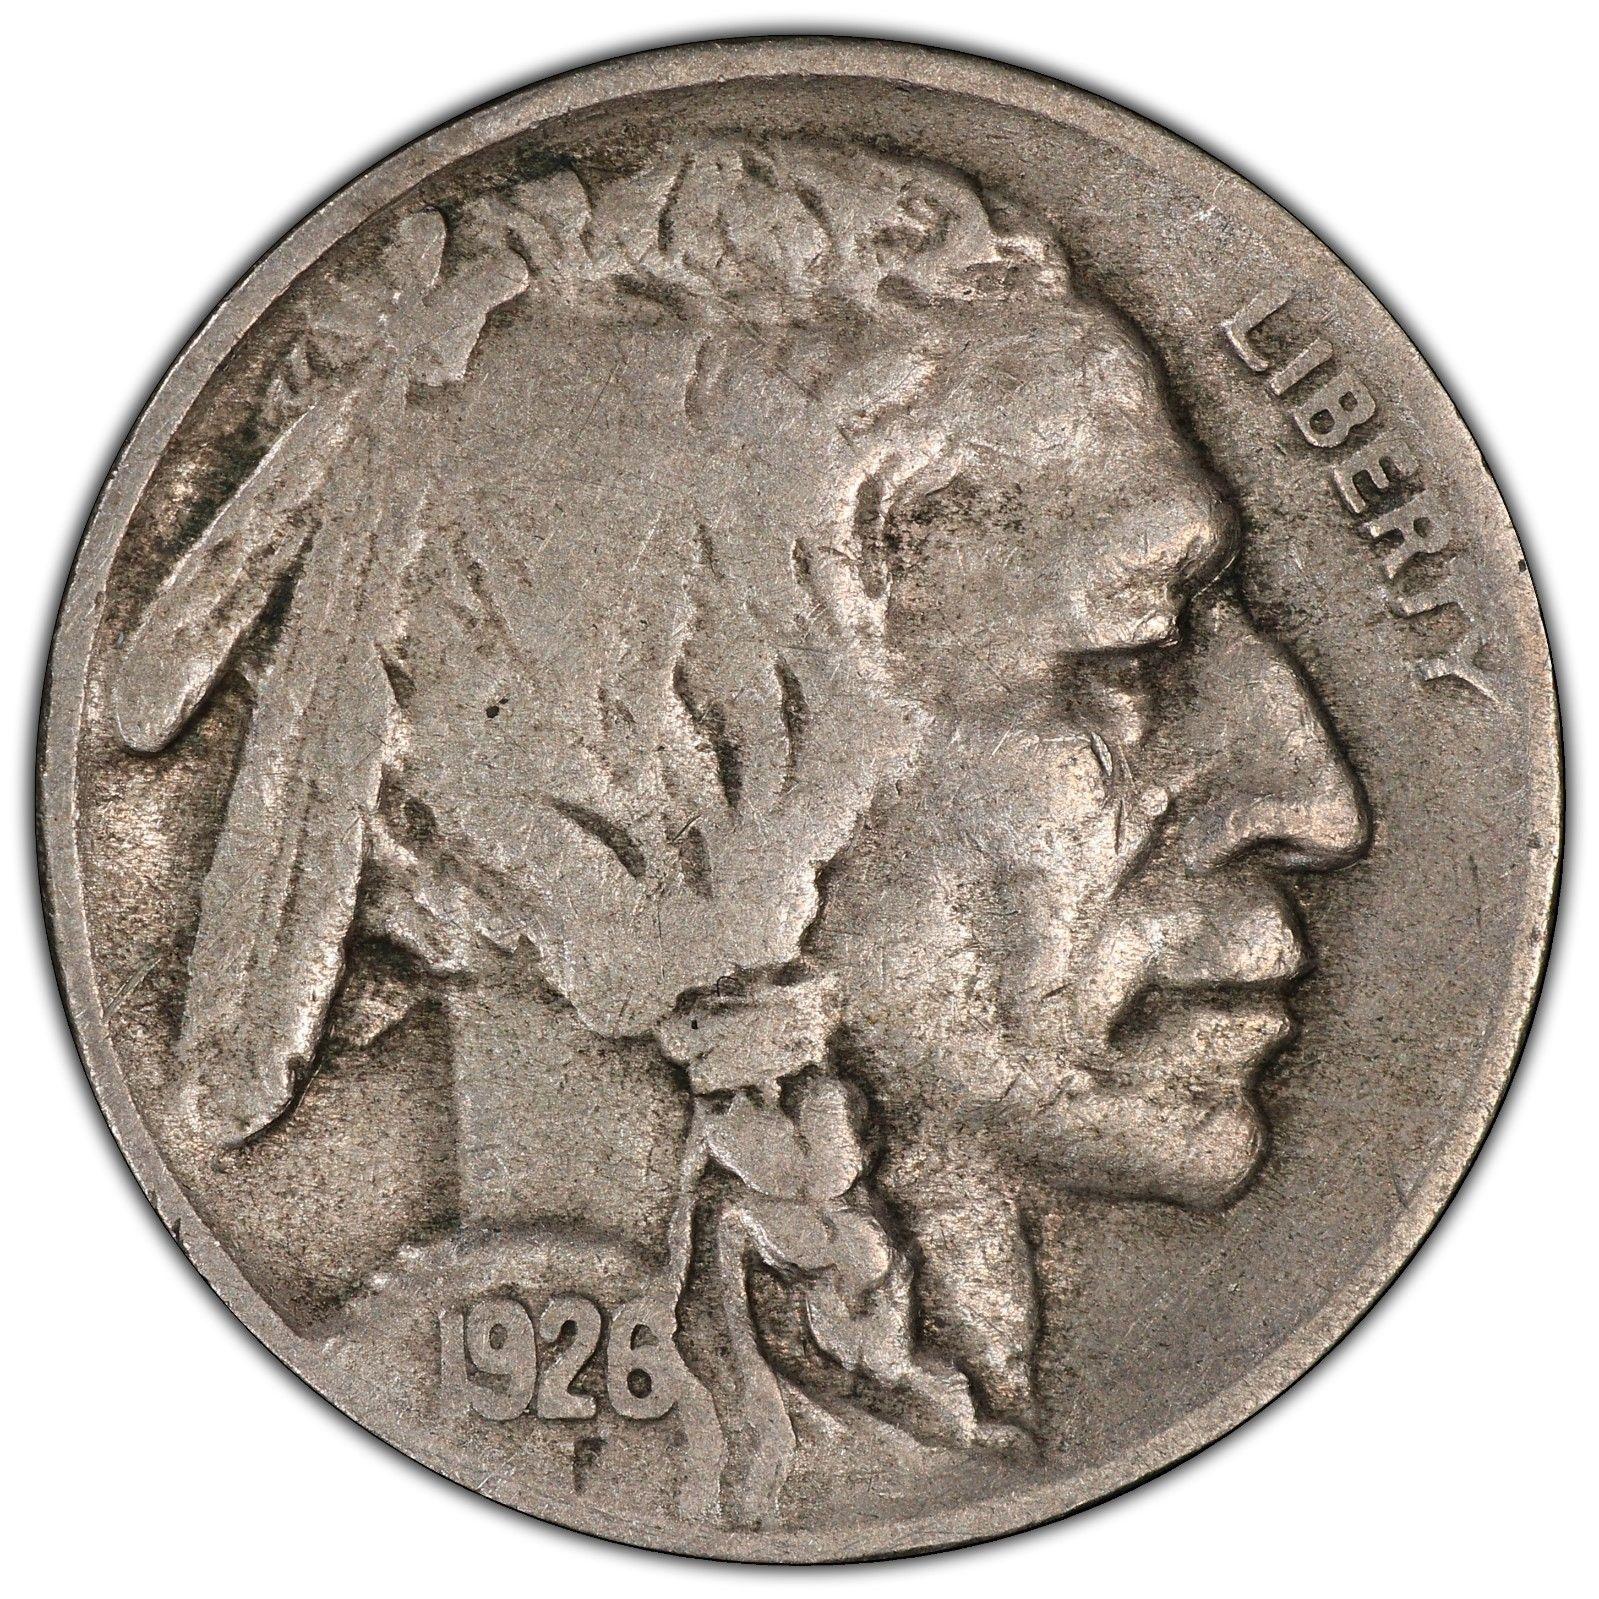 1926-S Buffalo Nickel Graded PCGS VF20